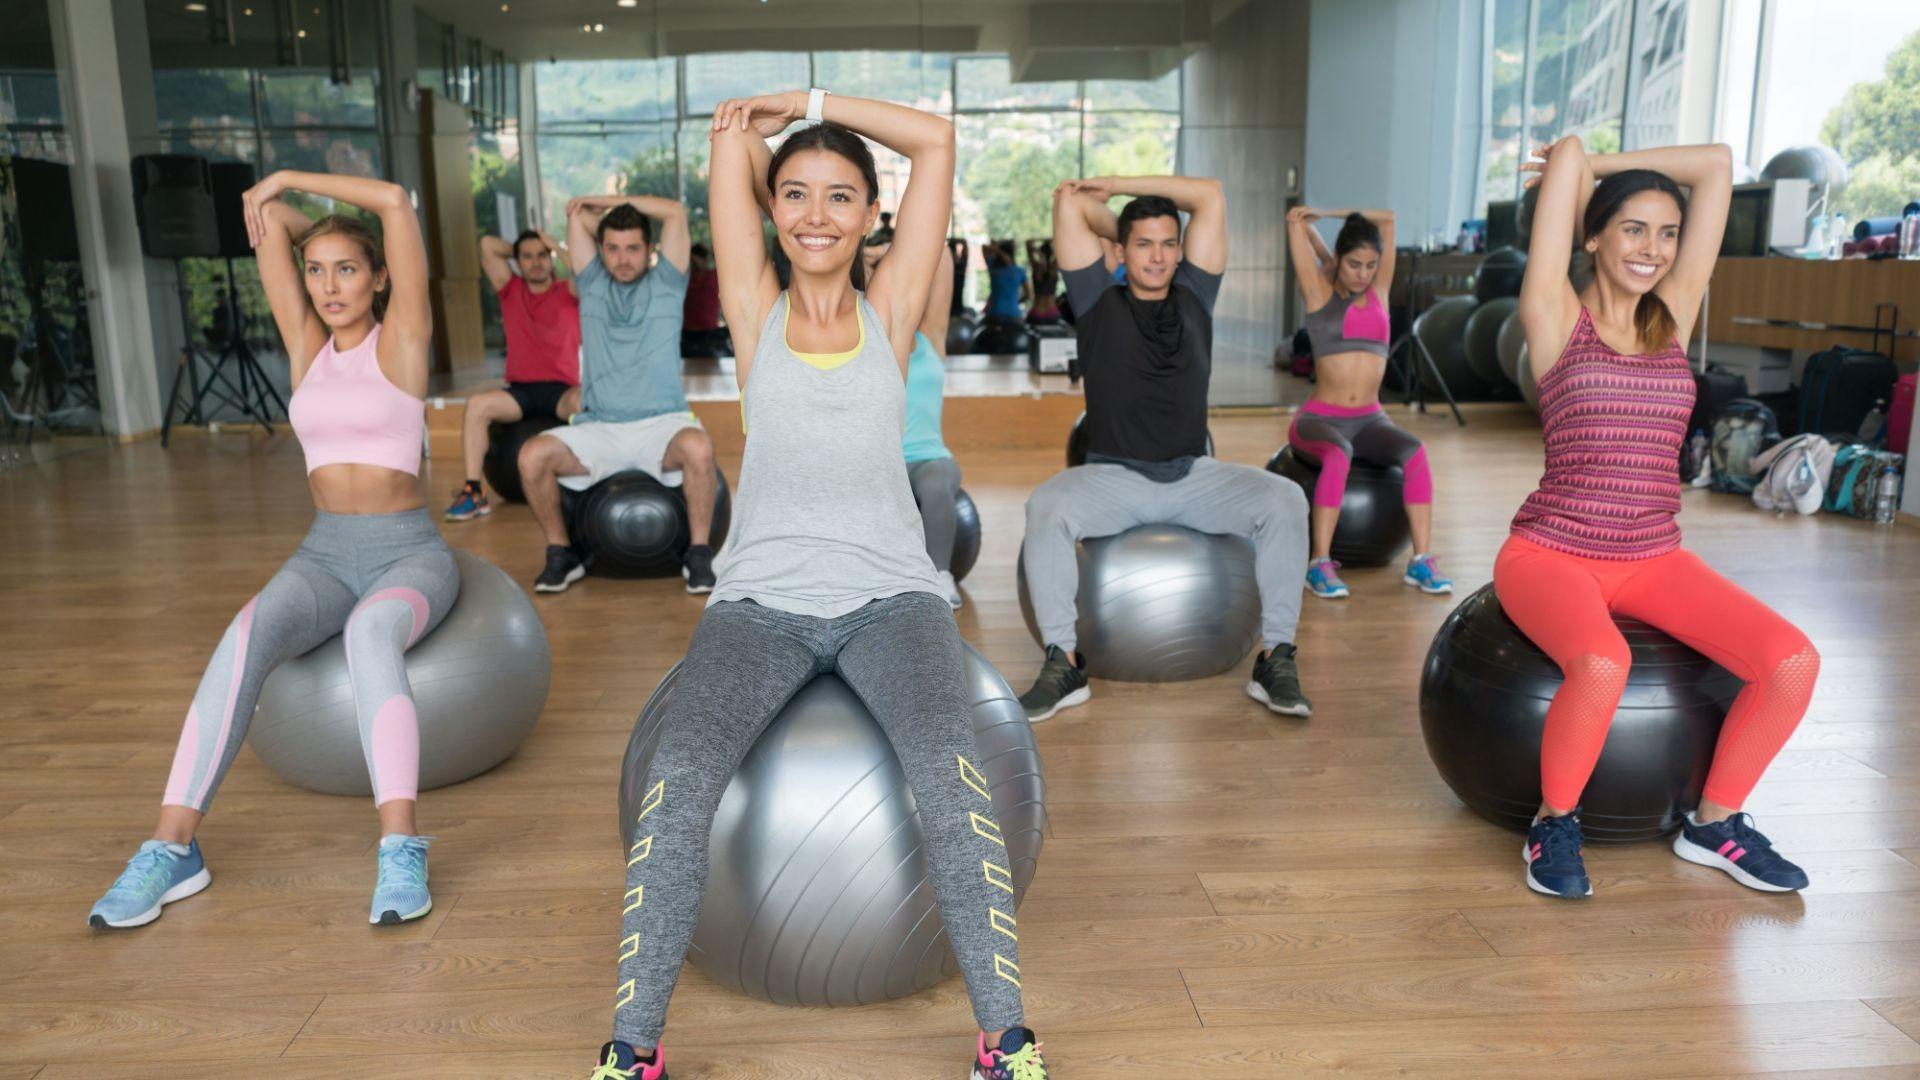 Centro de pilates Aranjuez